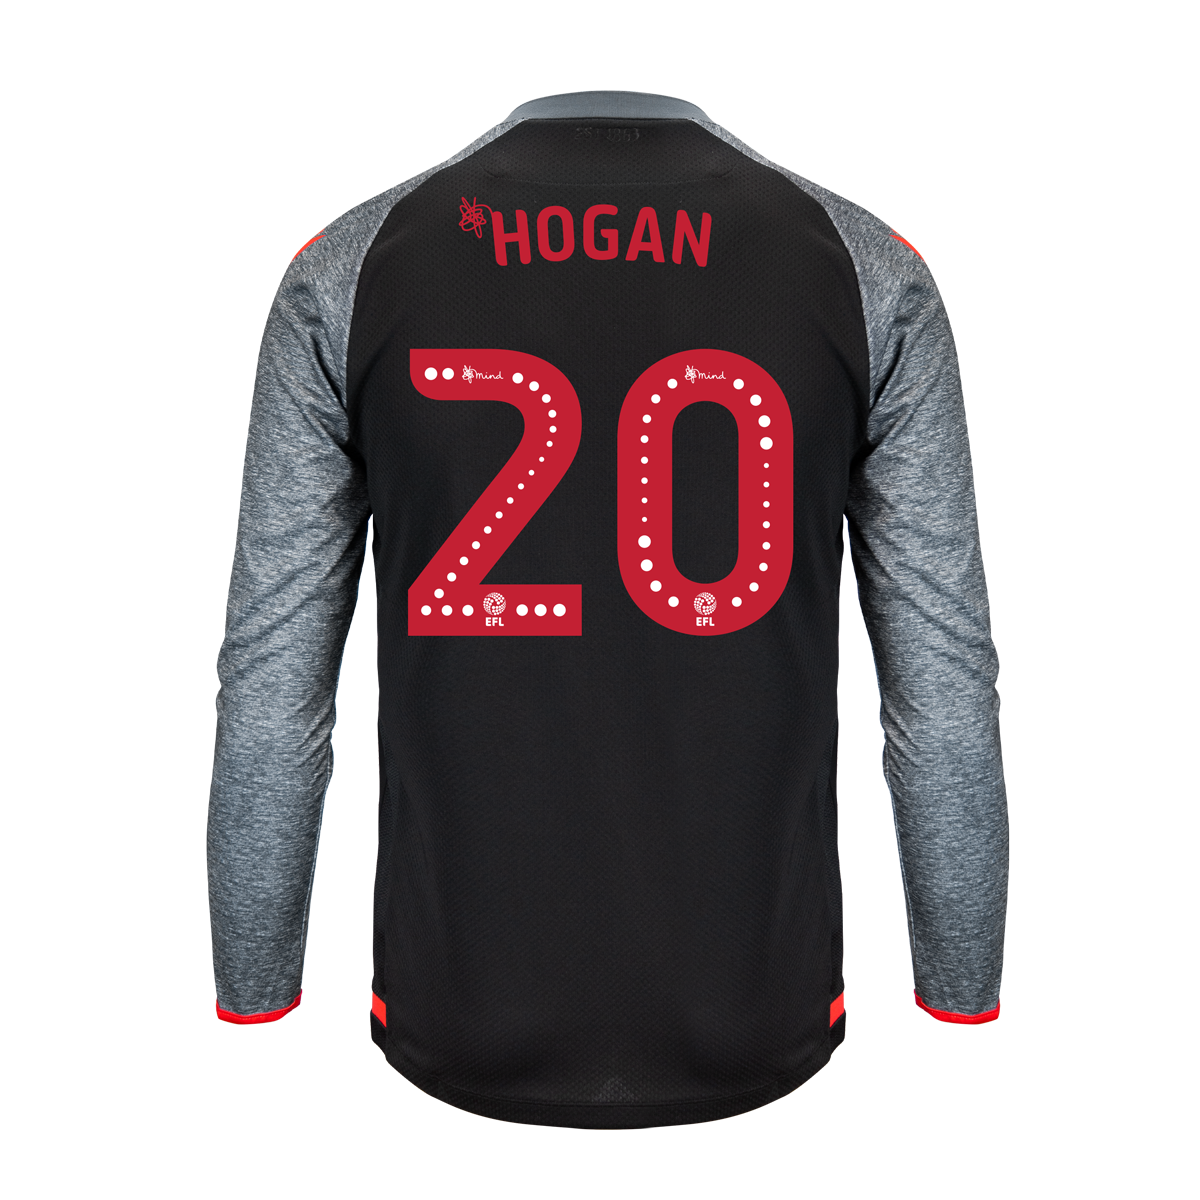 2019/20 Adult Away LS Shirt - Hogan